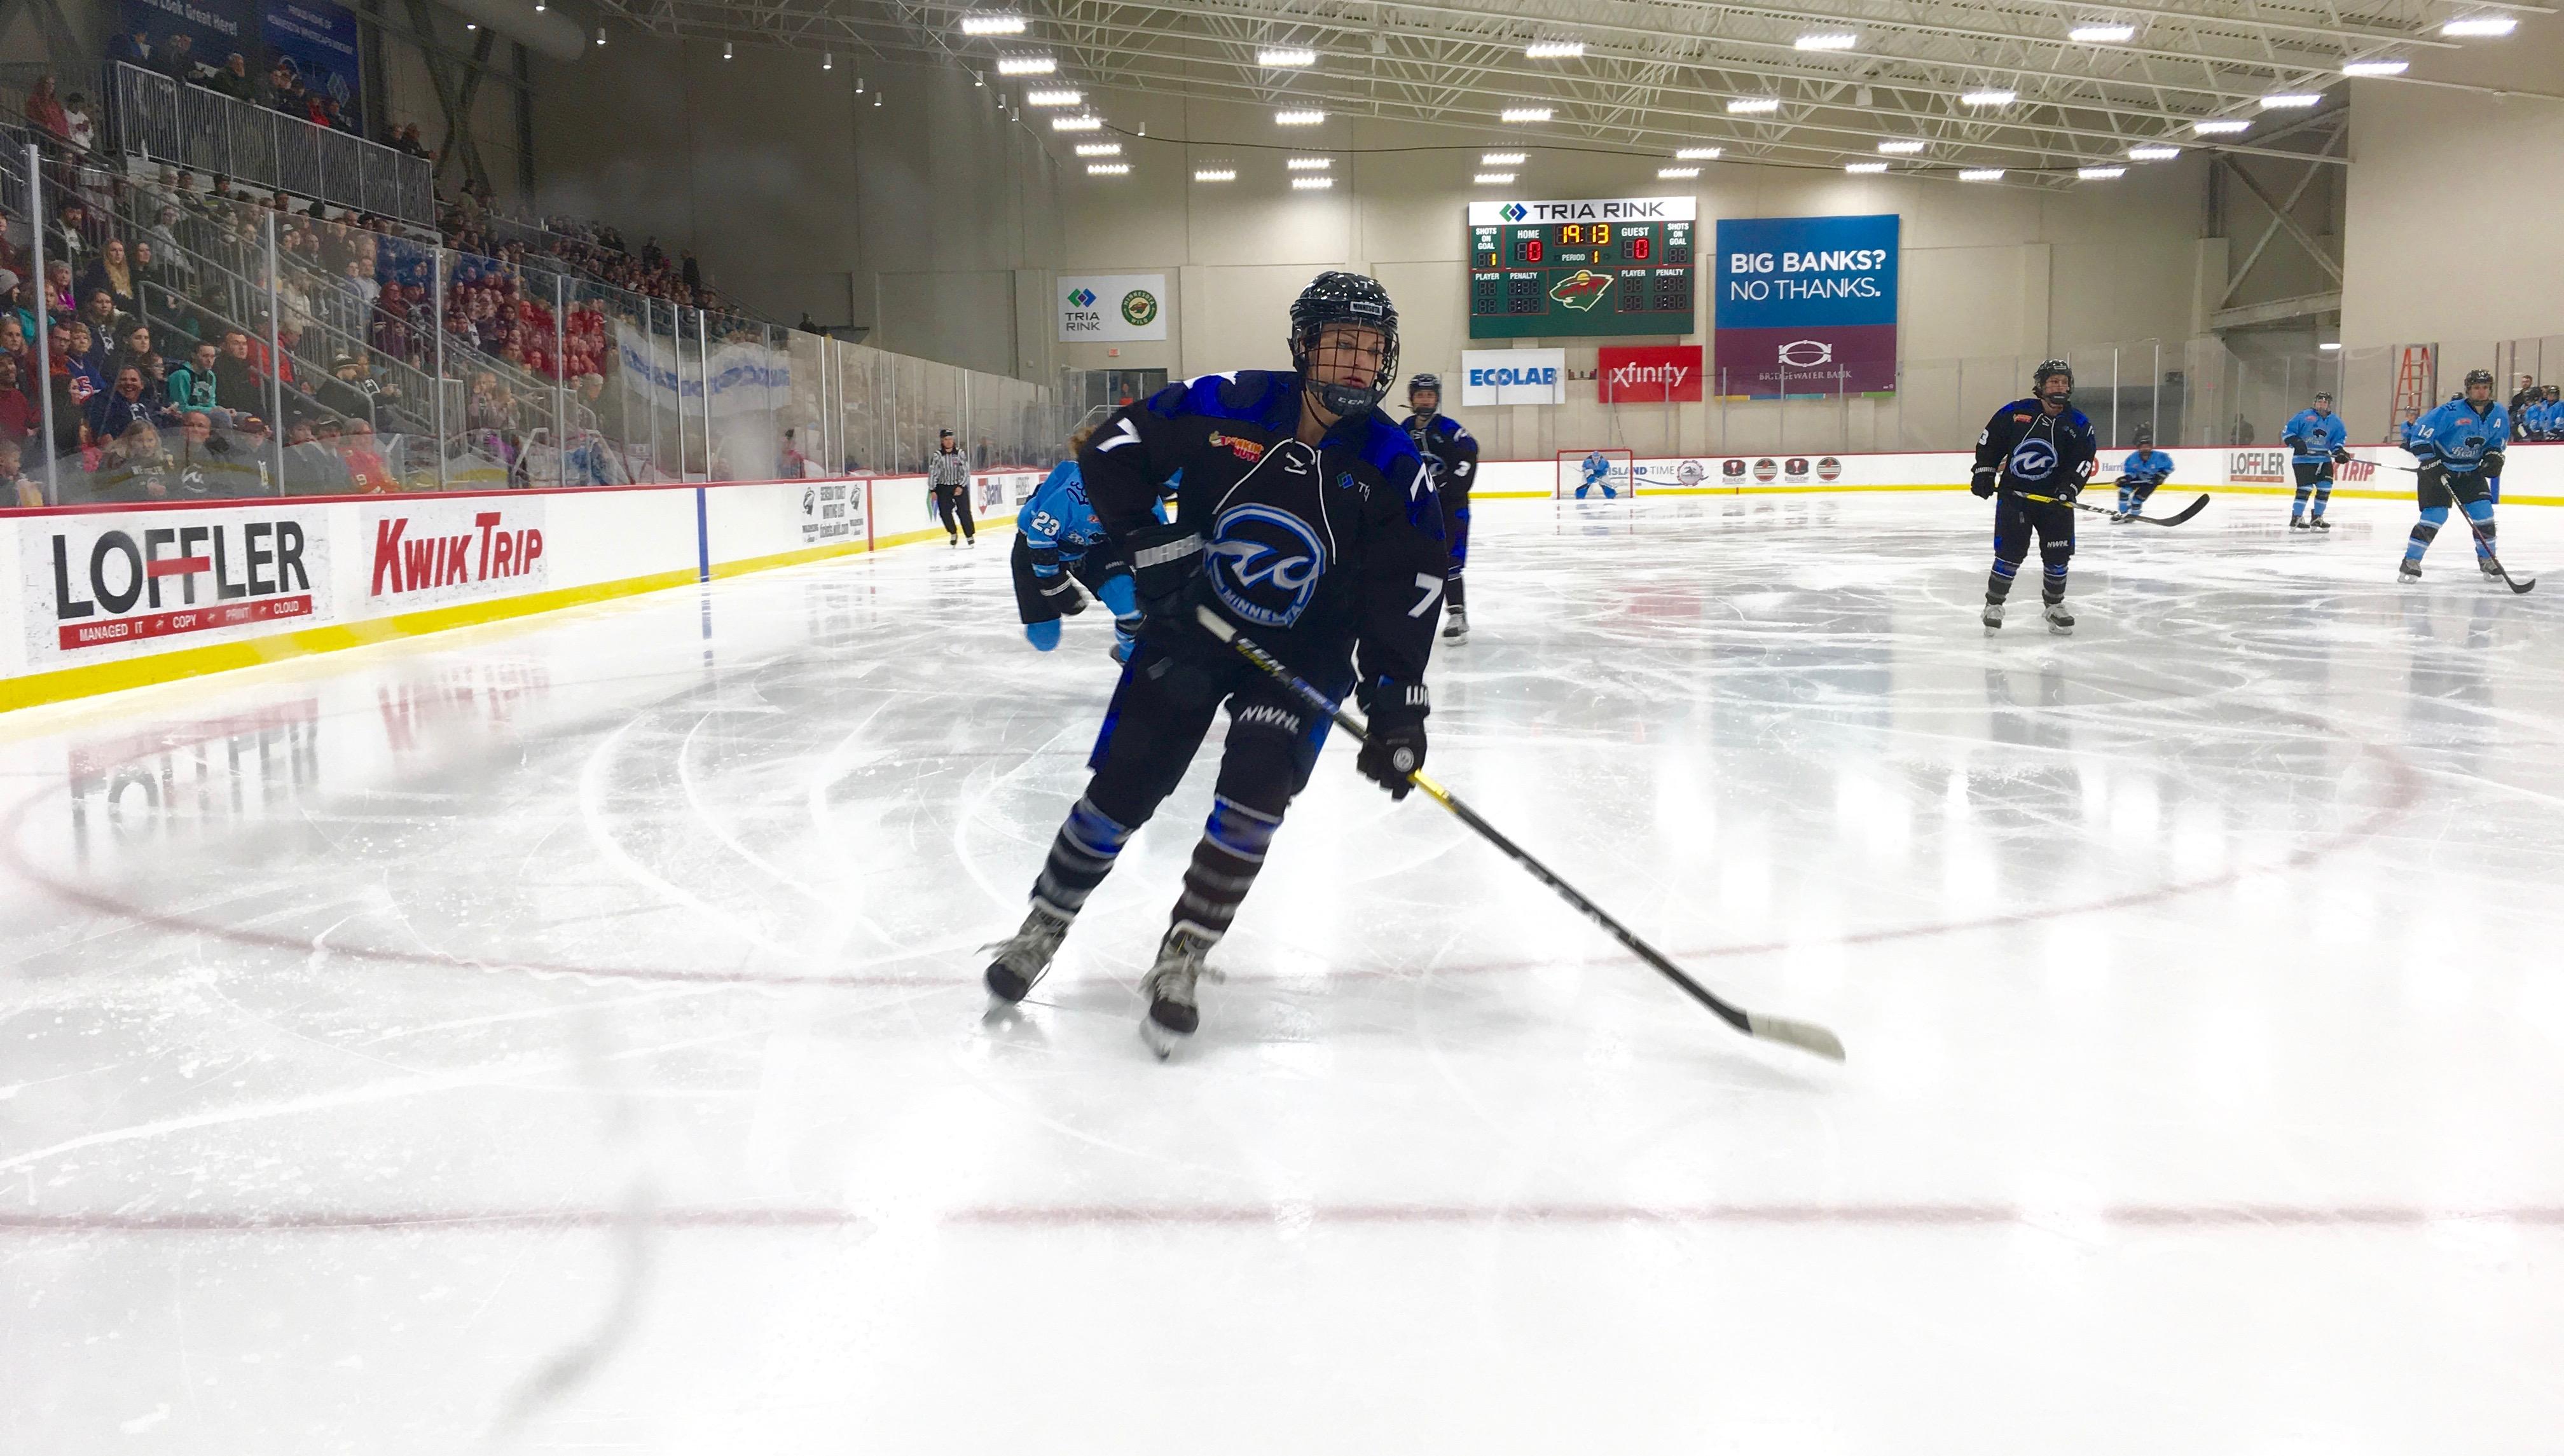 Emma Stauber (#7) skating for the Minnesota Whitecaps.